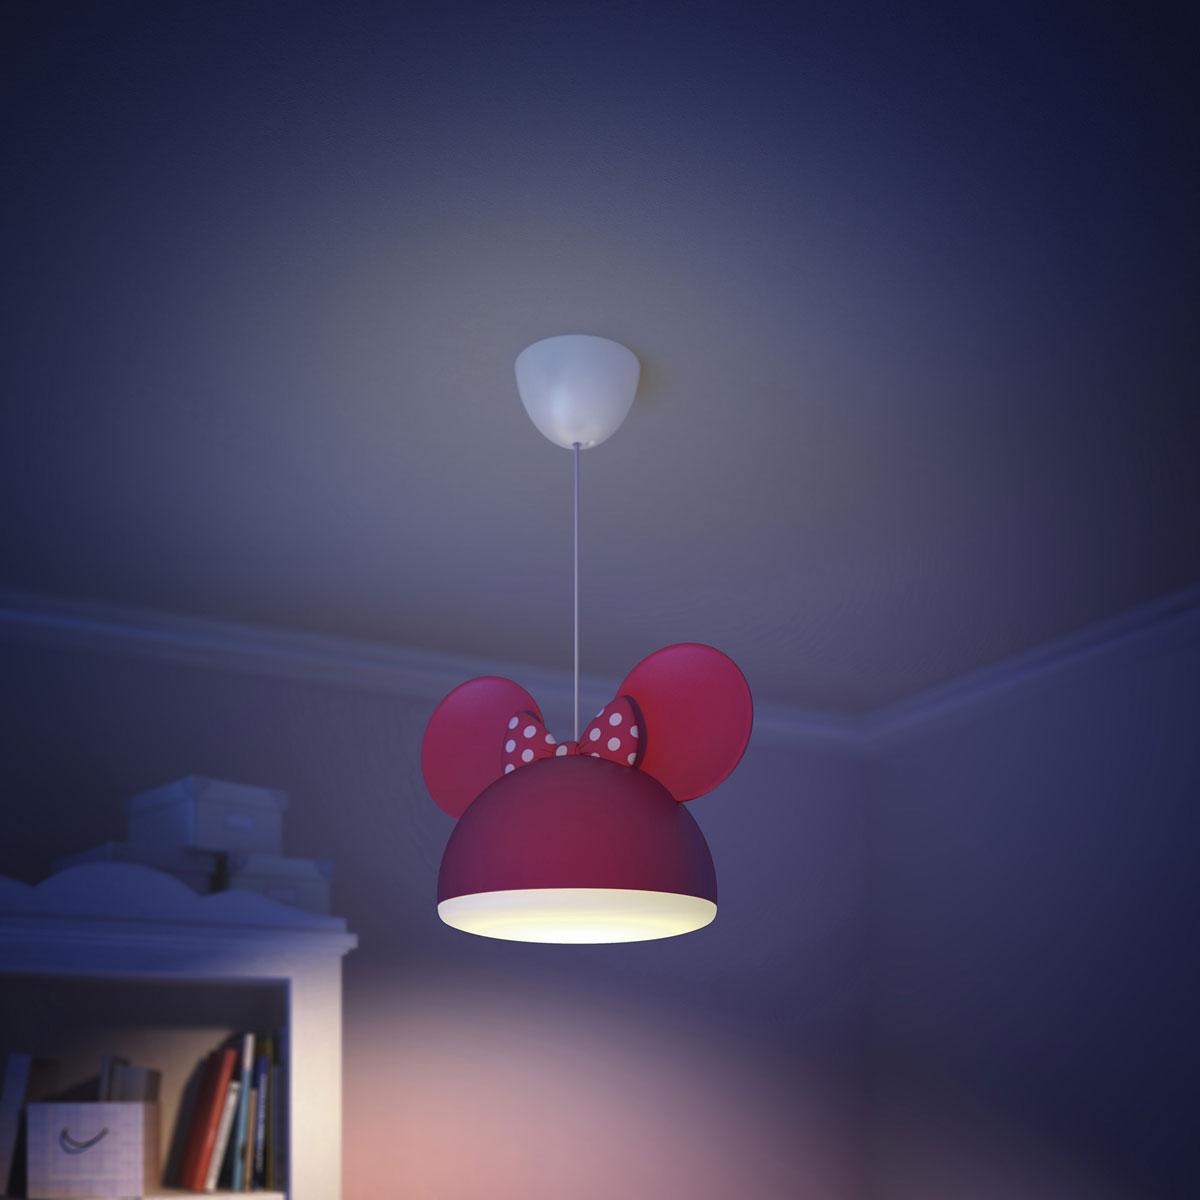 philips disney minnie mouse hanglamp rood. Black Bedroom Furniture Sets. Home Design Ideas